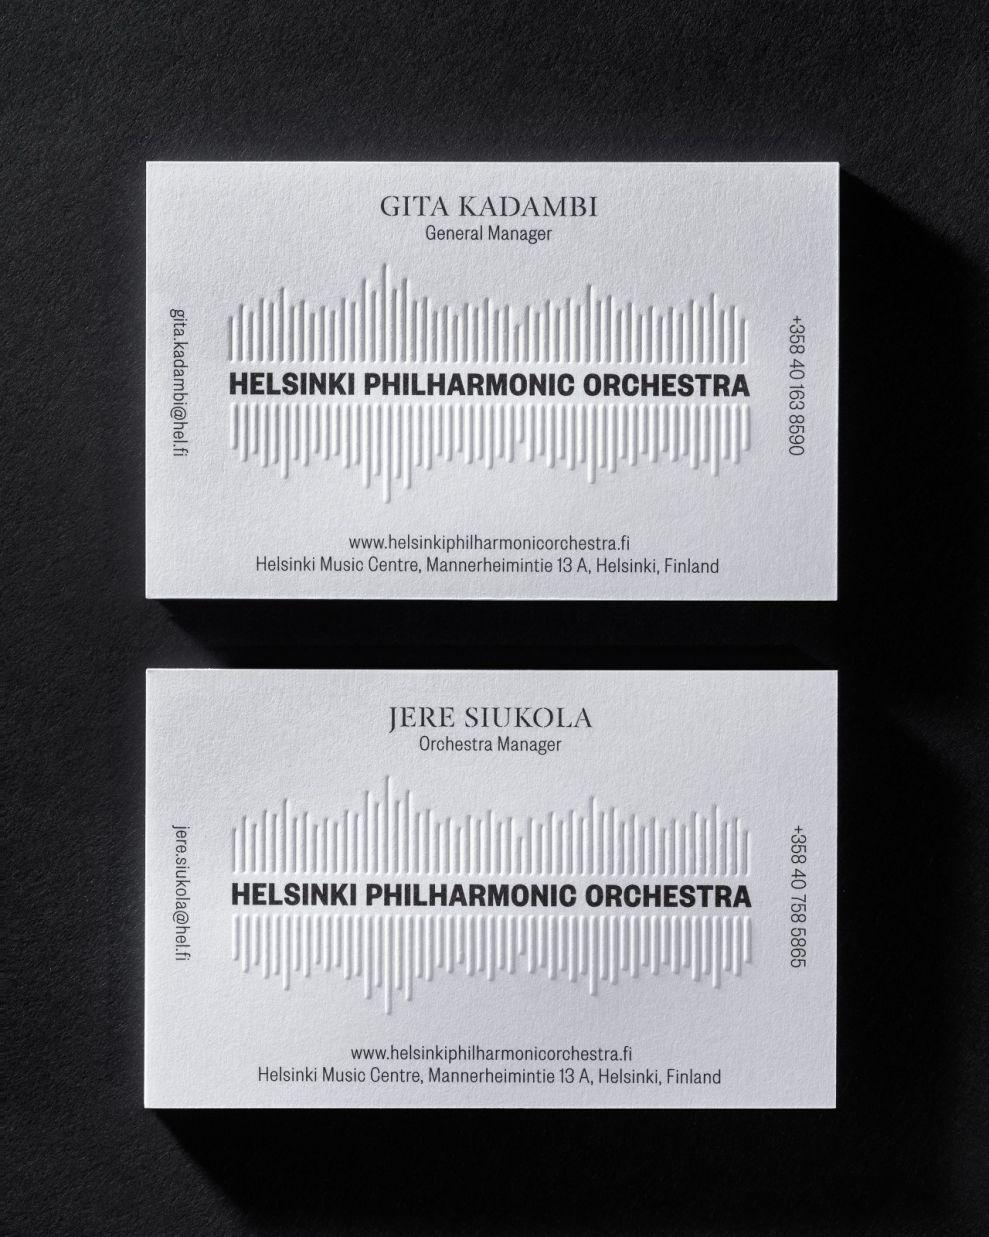 Helsinki Philharmonic Orchestra Elegant Print Design